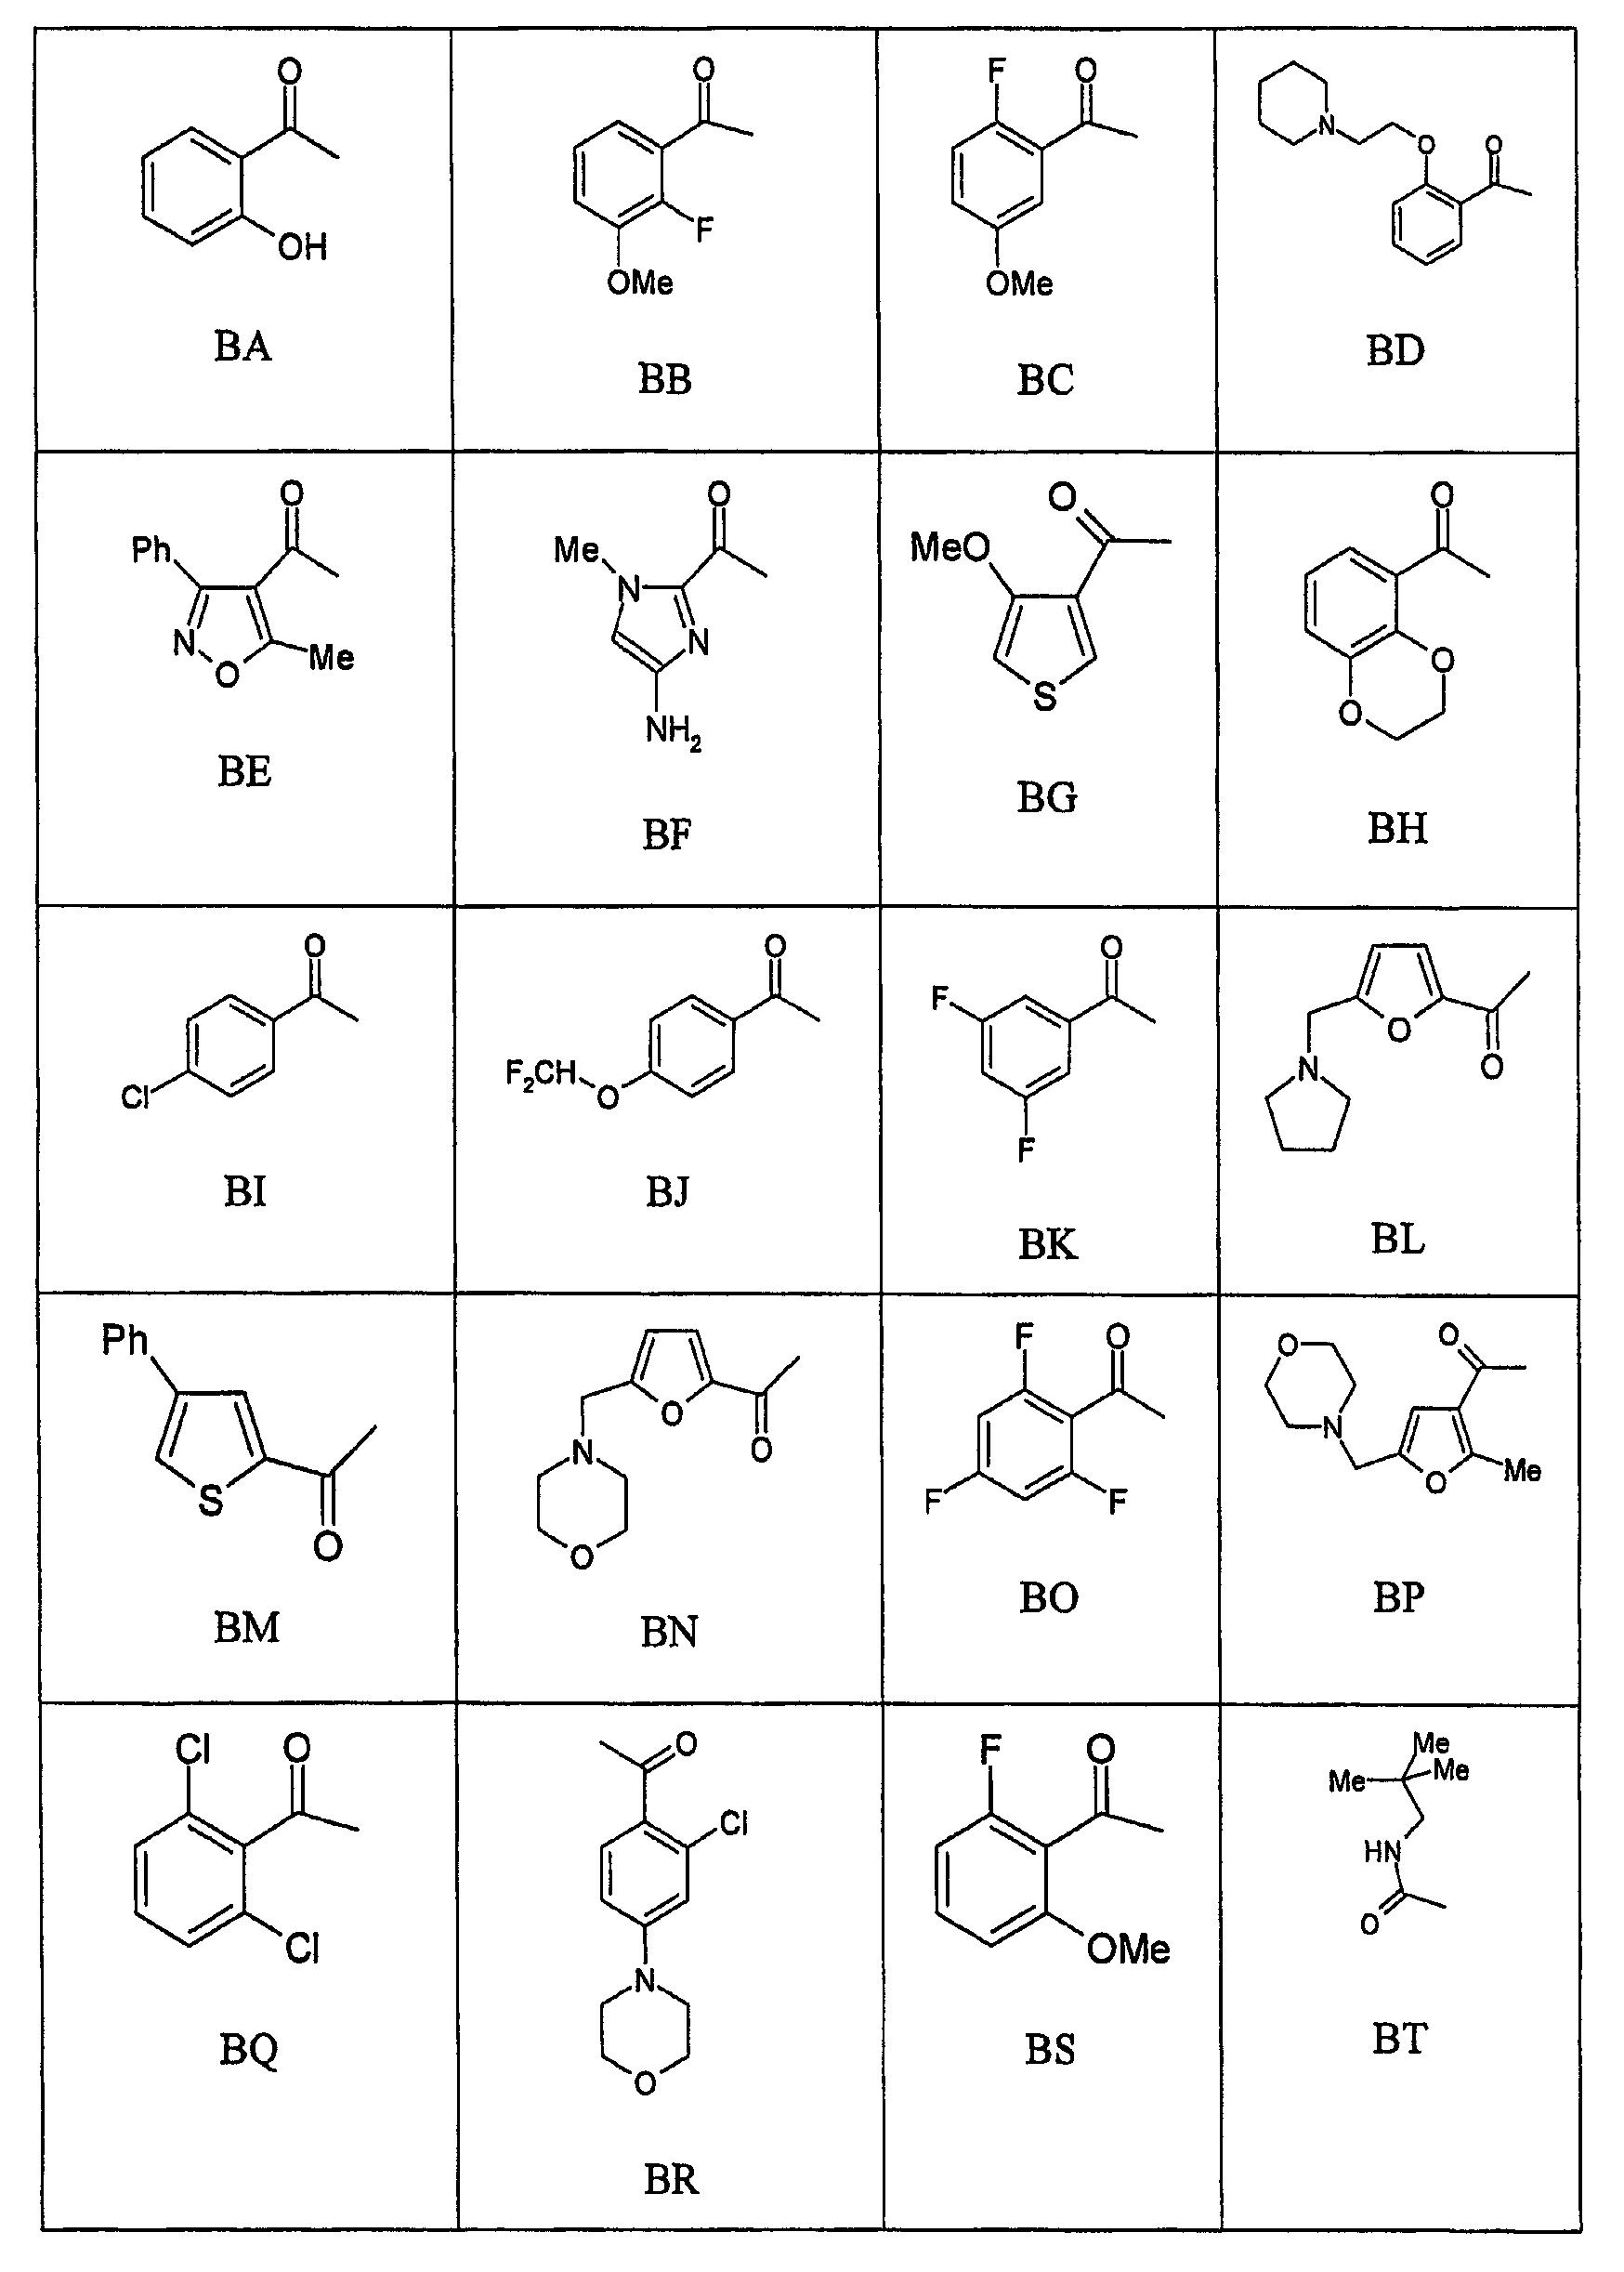 erythromycin for treating acne